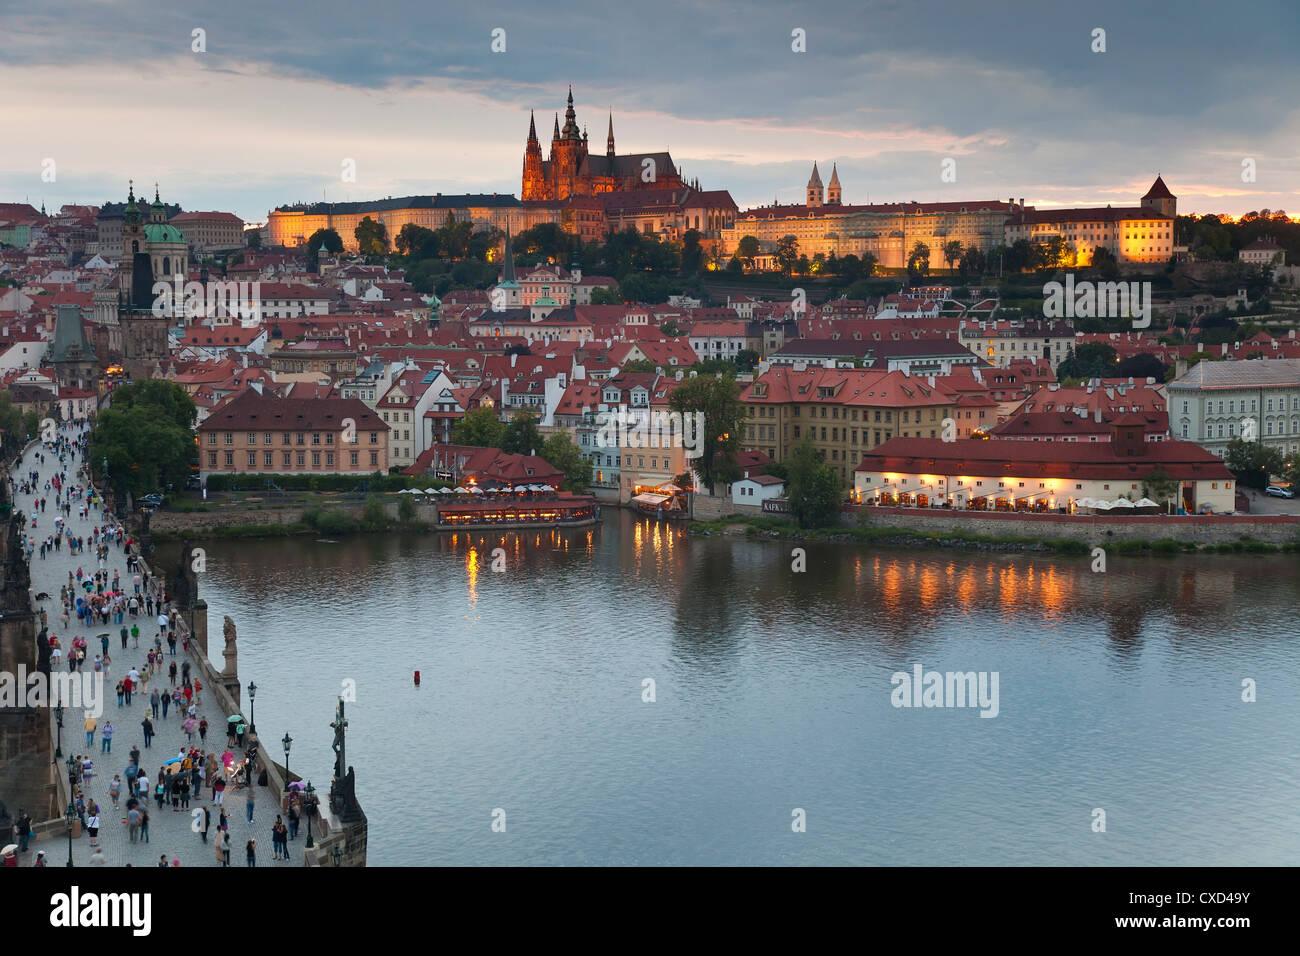 St. Vitus Cathedral, Charles Bridge, River Vltava and the Castle District illuminated at night, Prague, Czech Republic - Stock Image